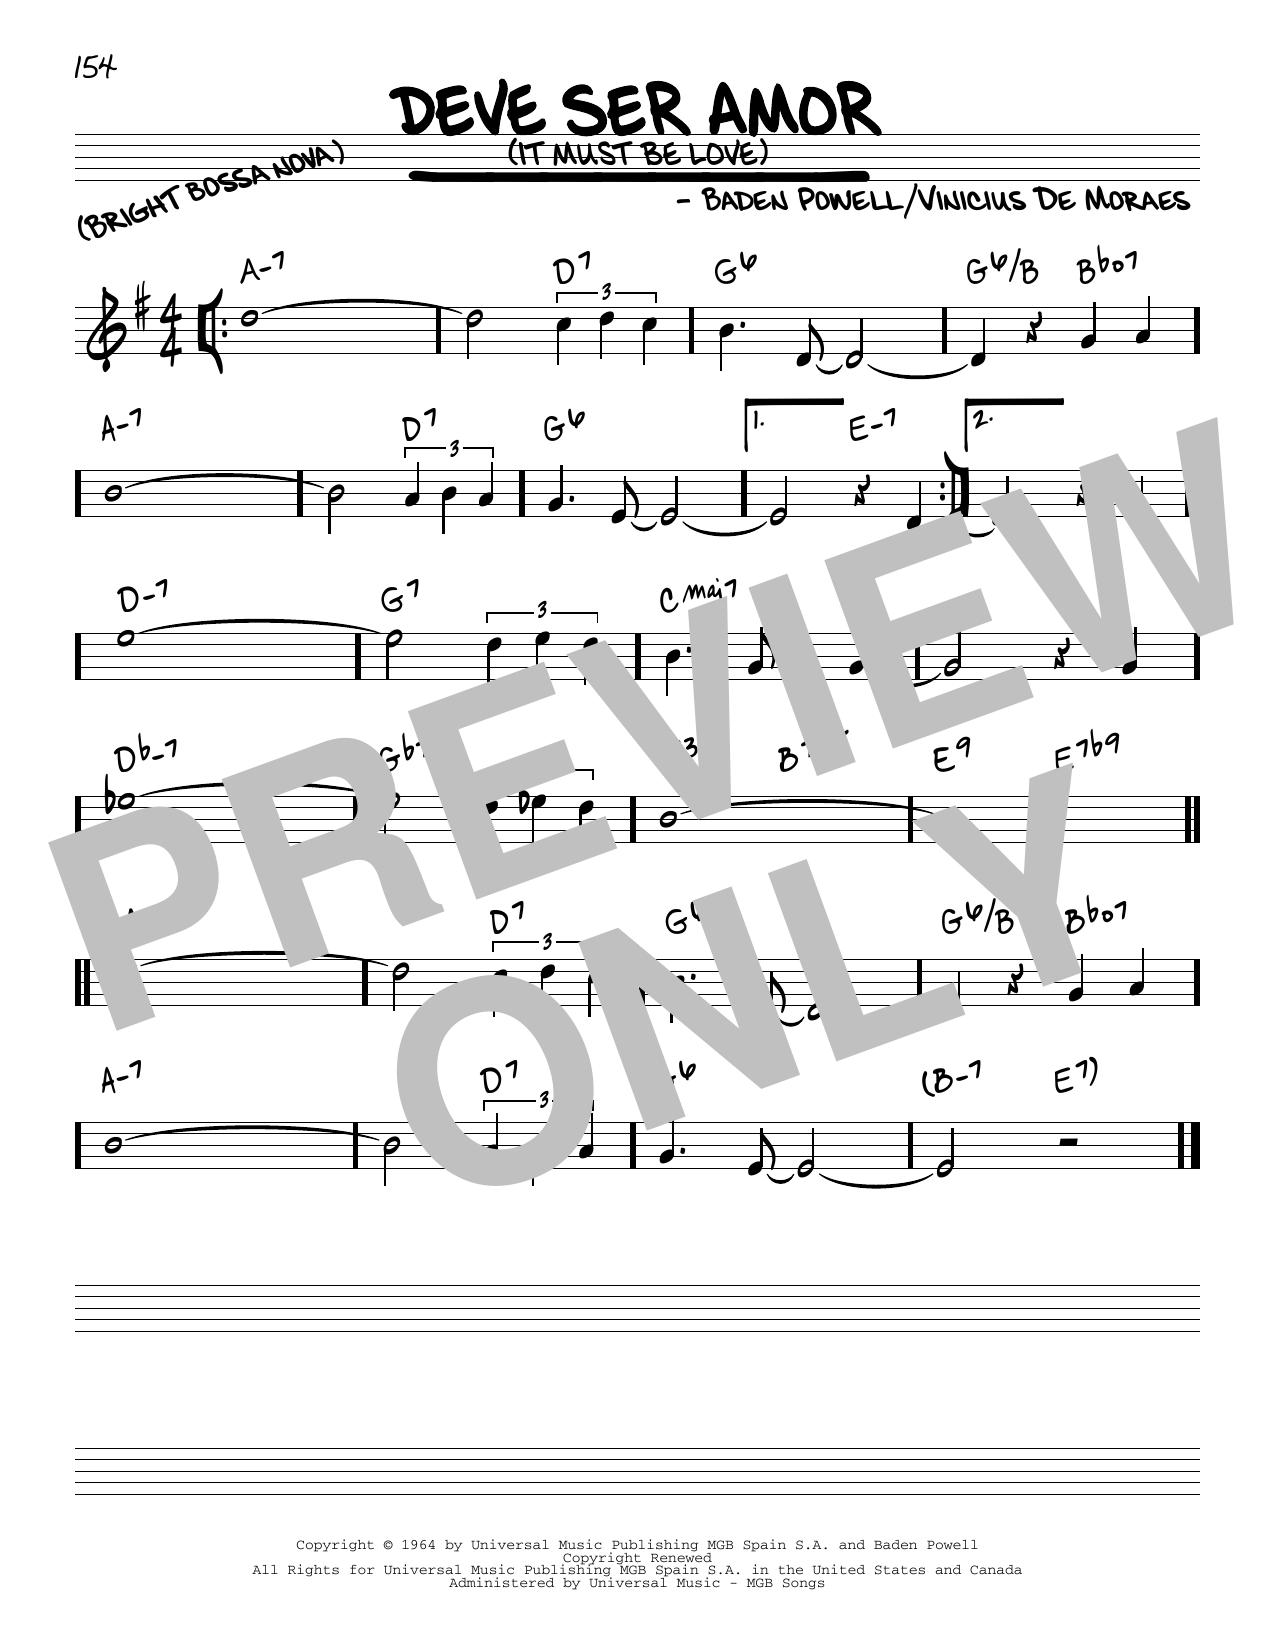 Vinicius de Moraes Deve Ser Amor sheet music notes and chords. Download Printable PDF.